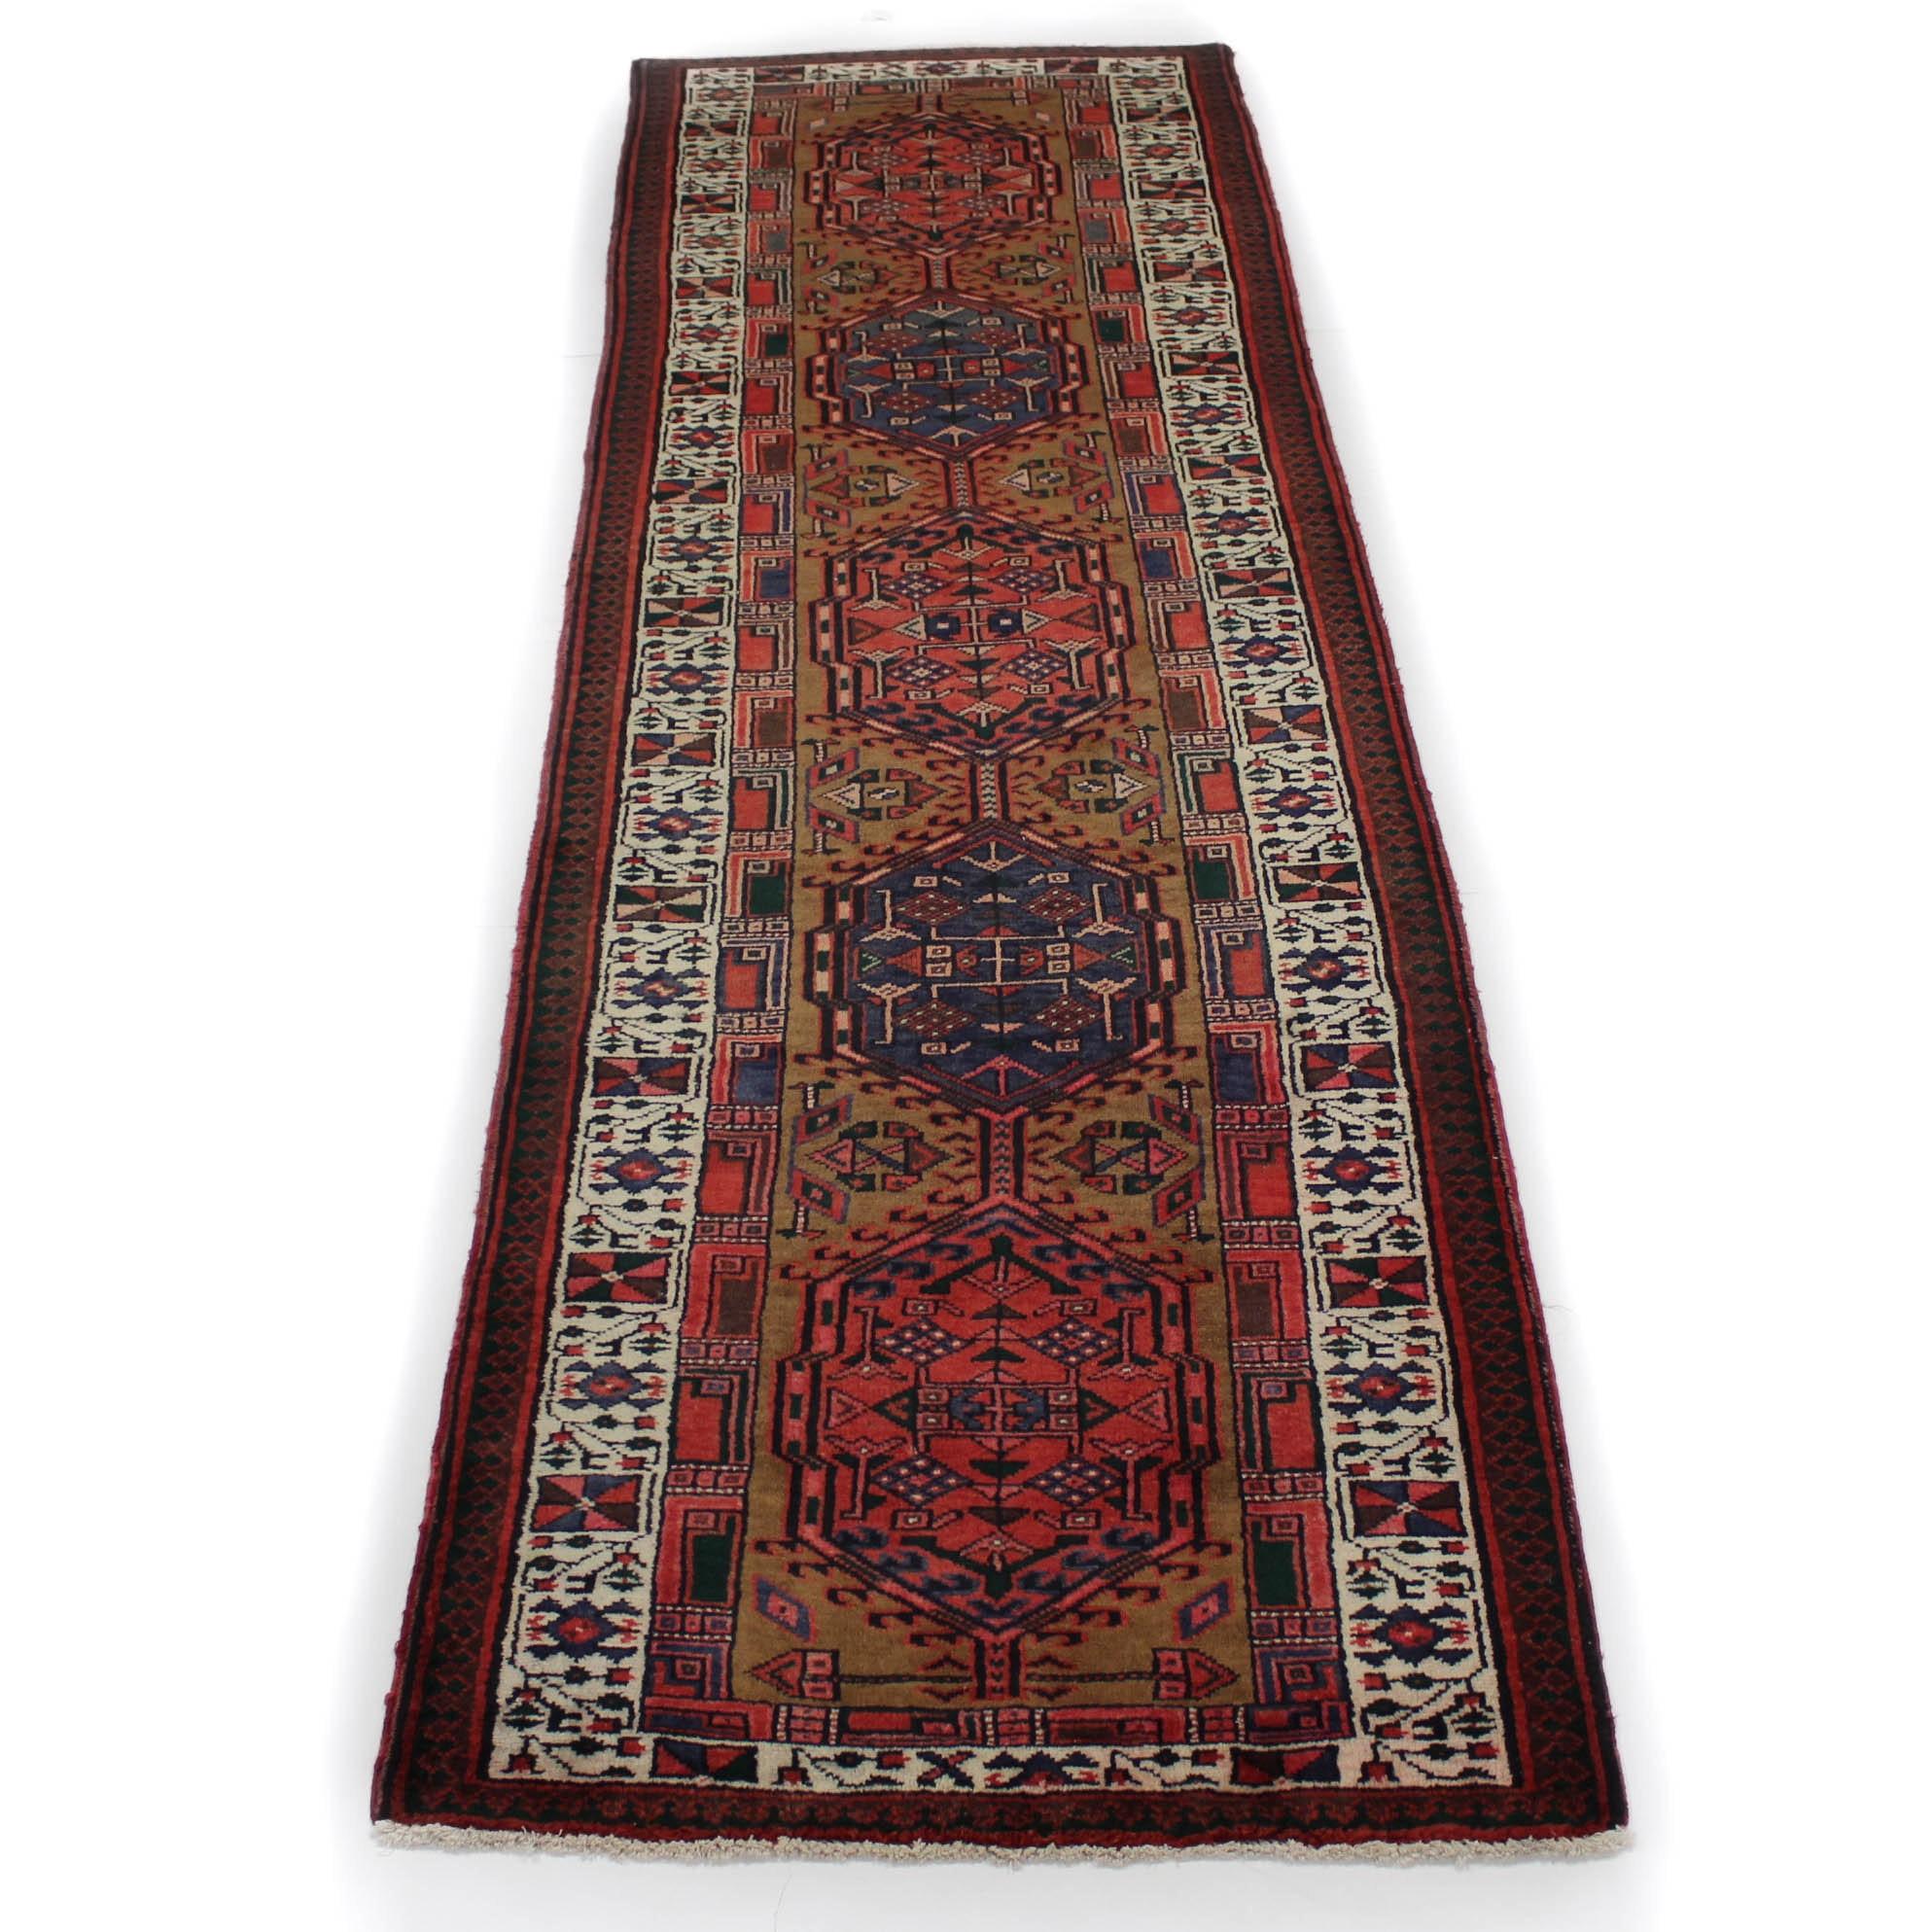 3'2 x 11' Semi-Antique Hand-Knotted Persian Serab Carpet Runner